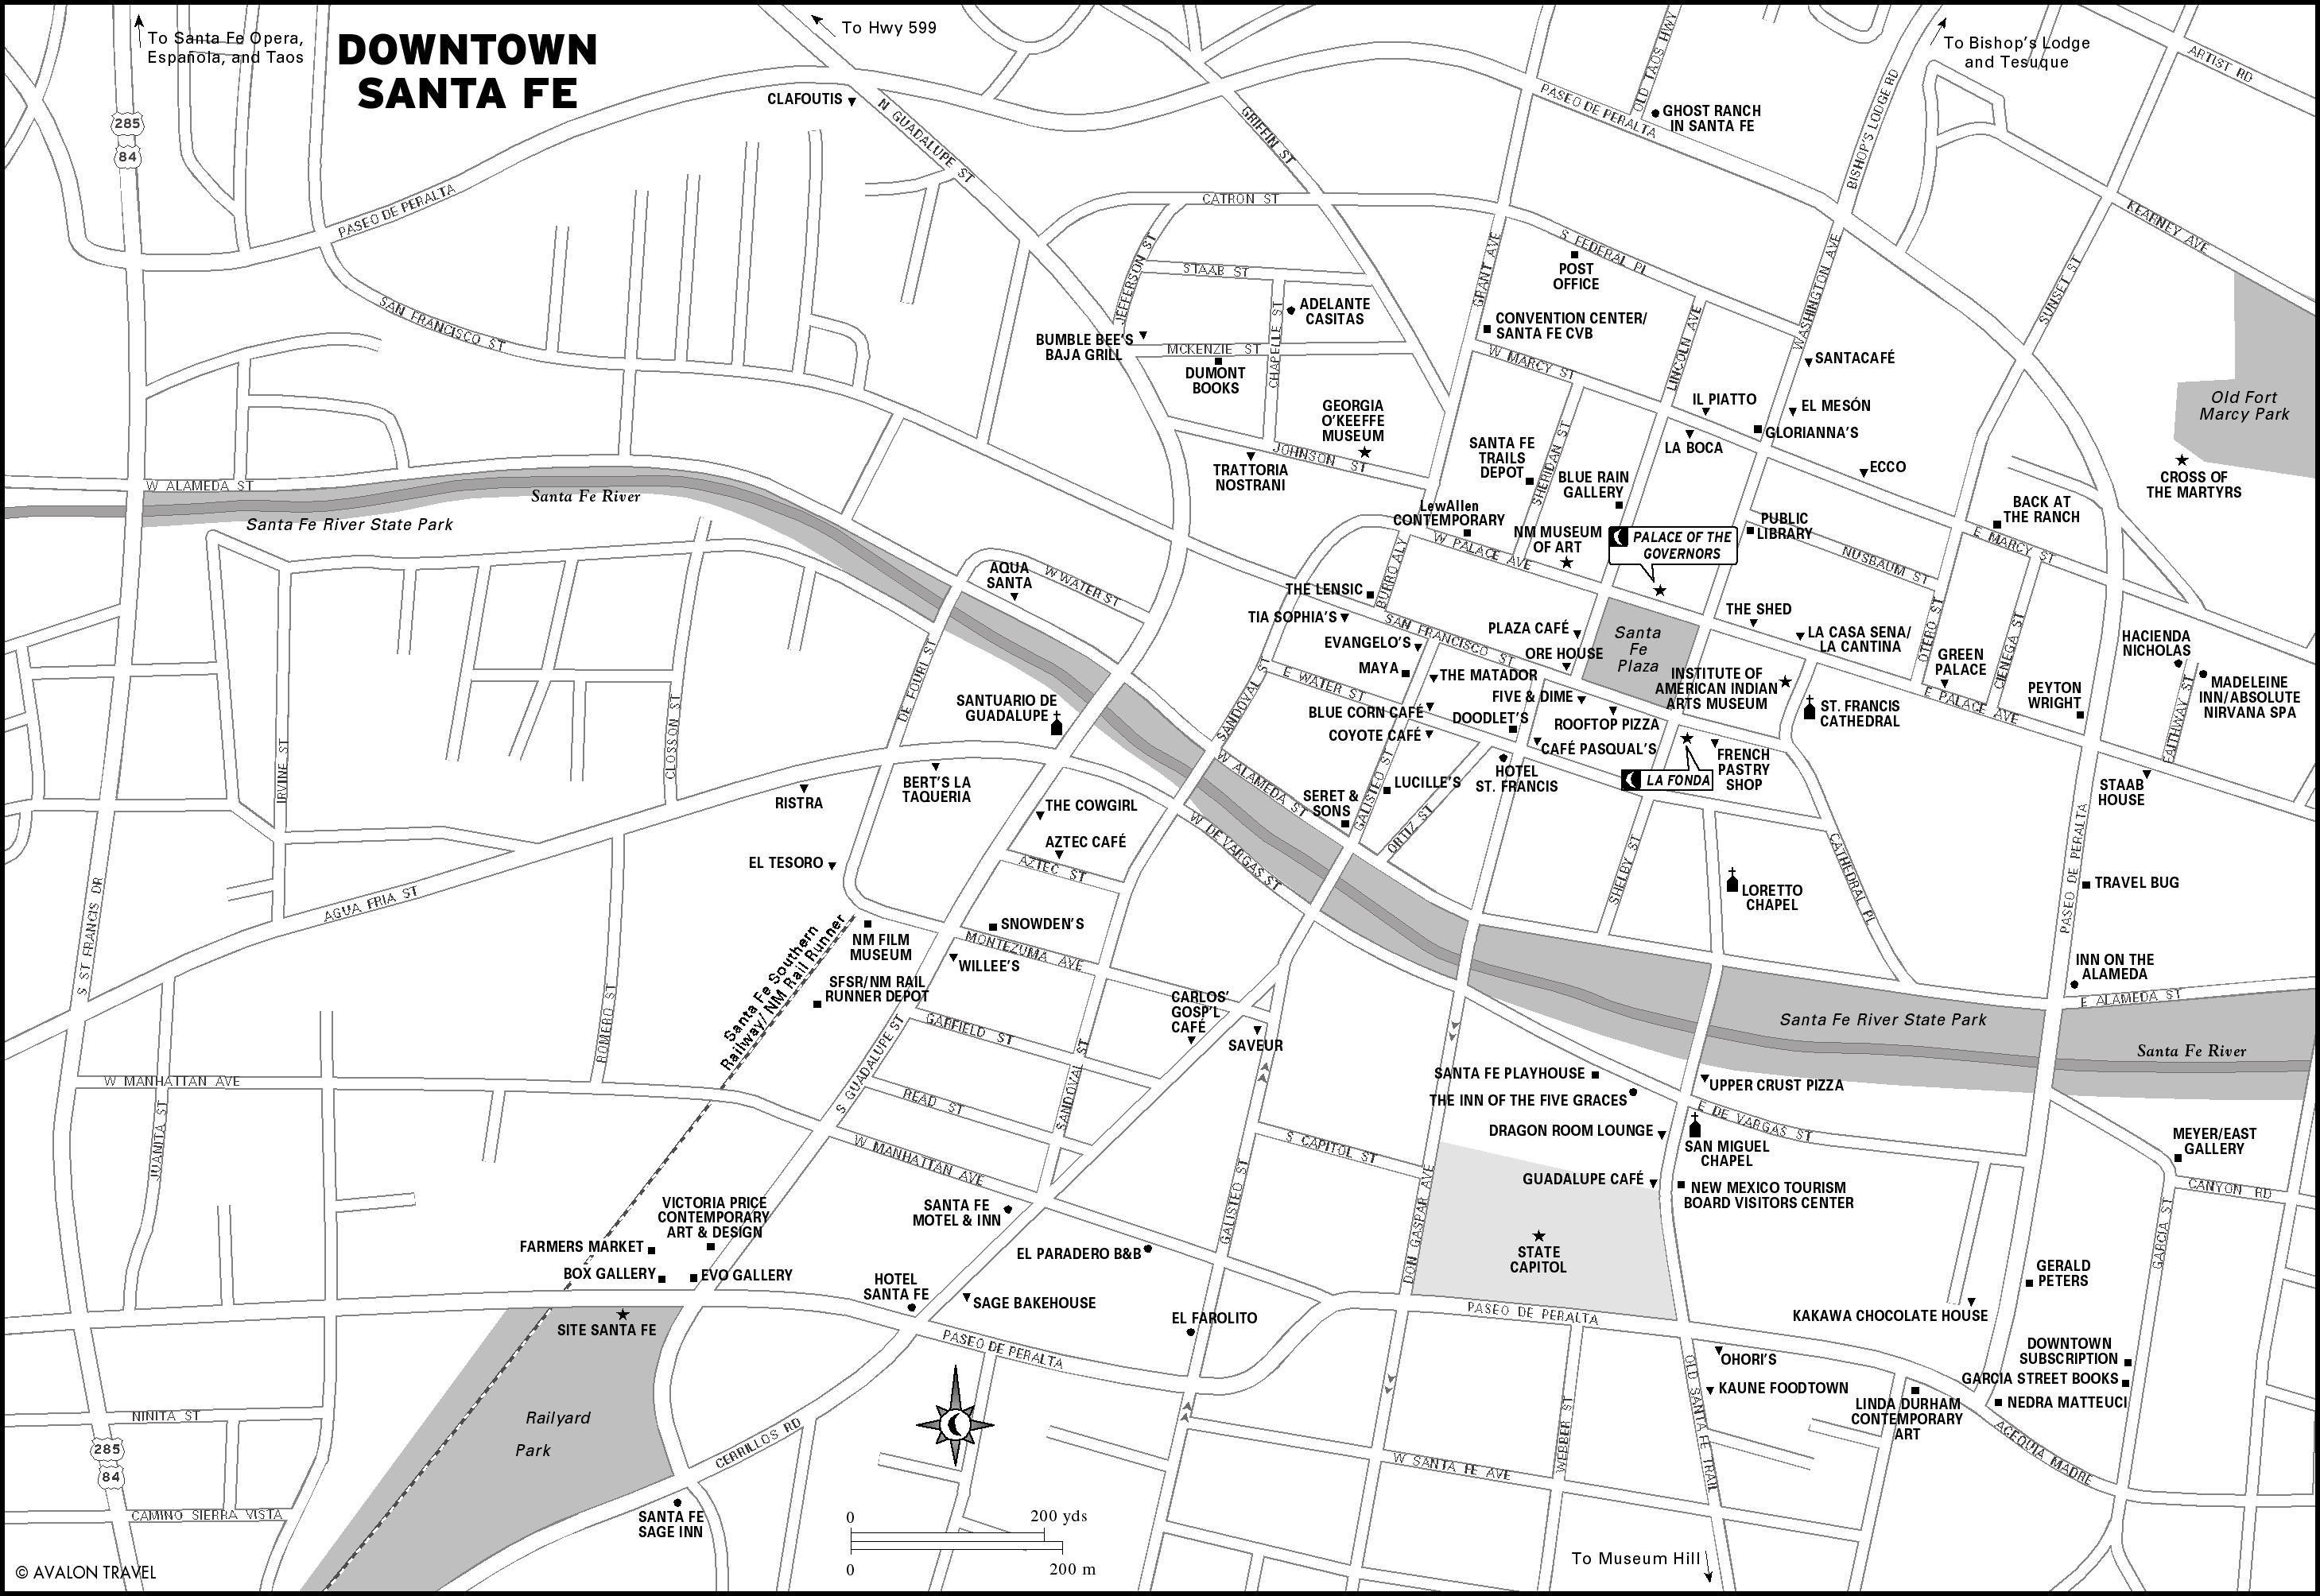 Downtown Santa Fe New Mexico Map